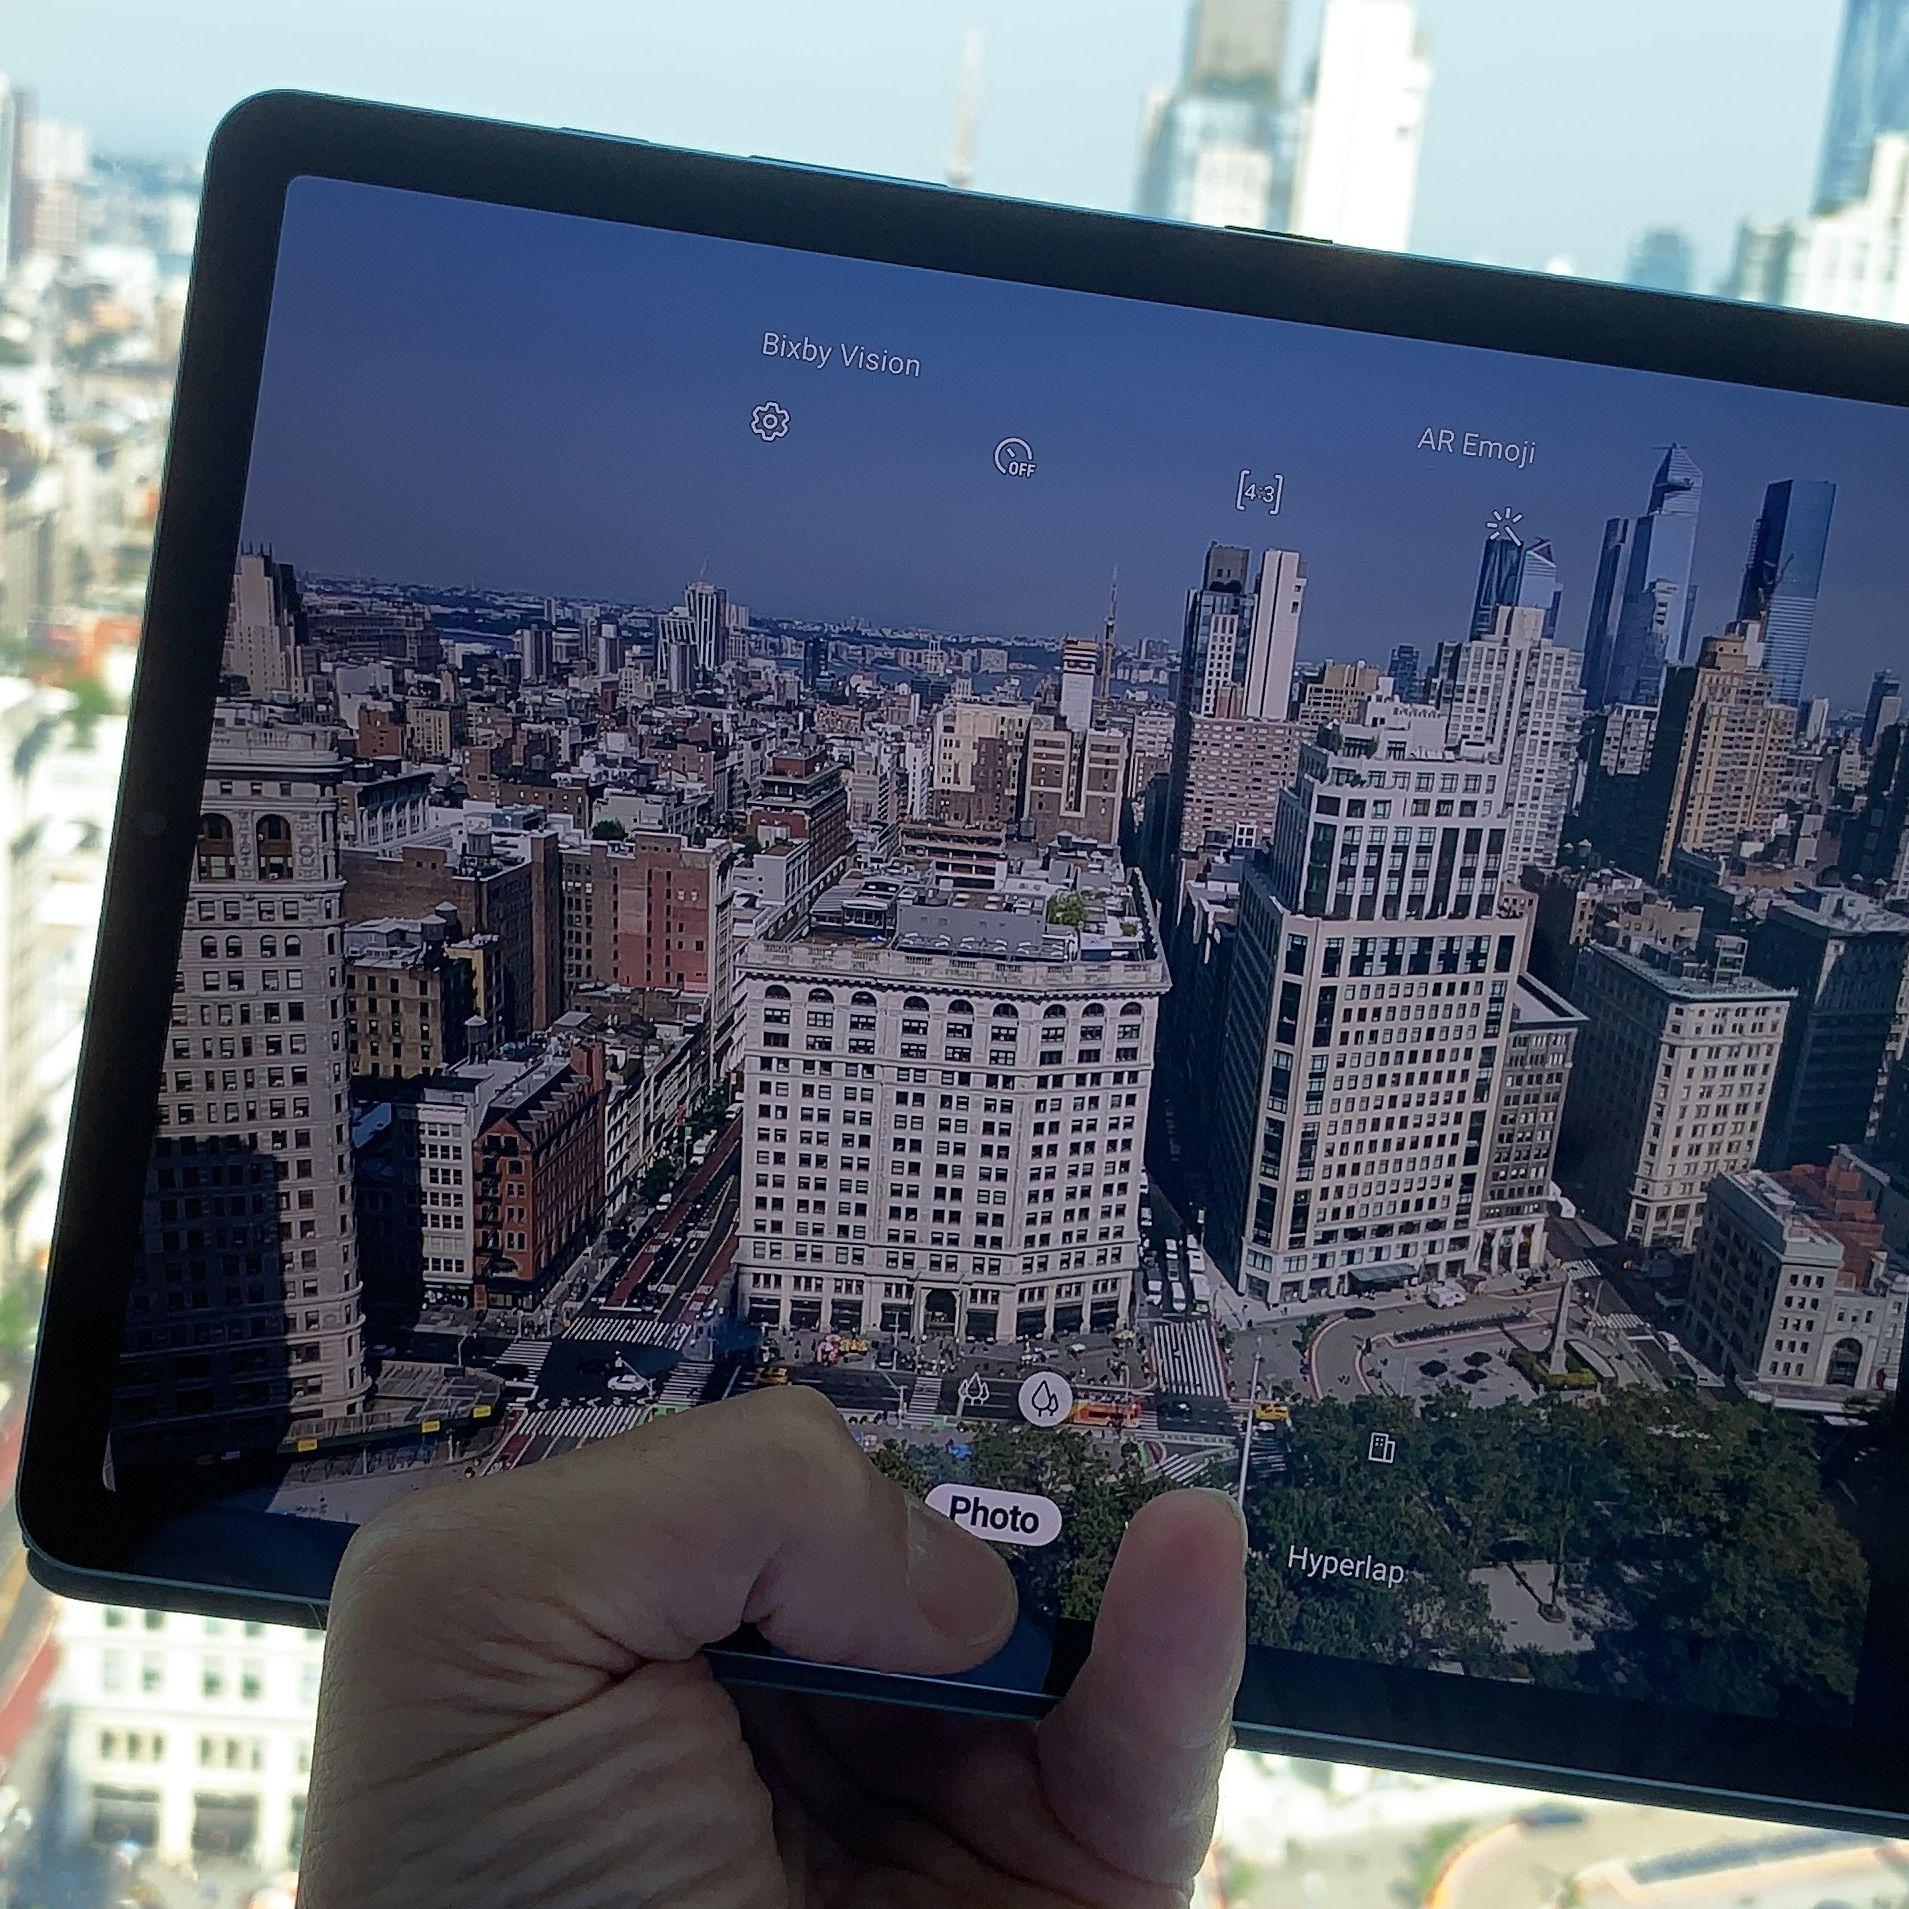 Samsung Galaxy Tab S6 Hands On